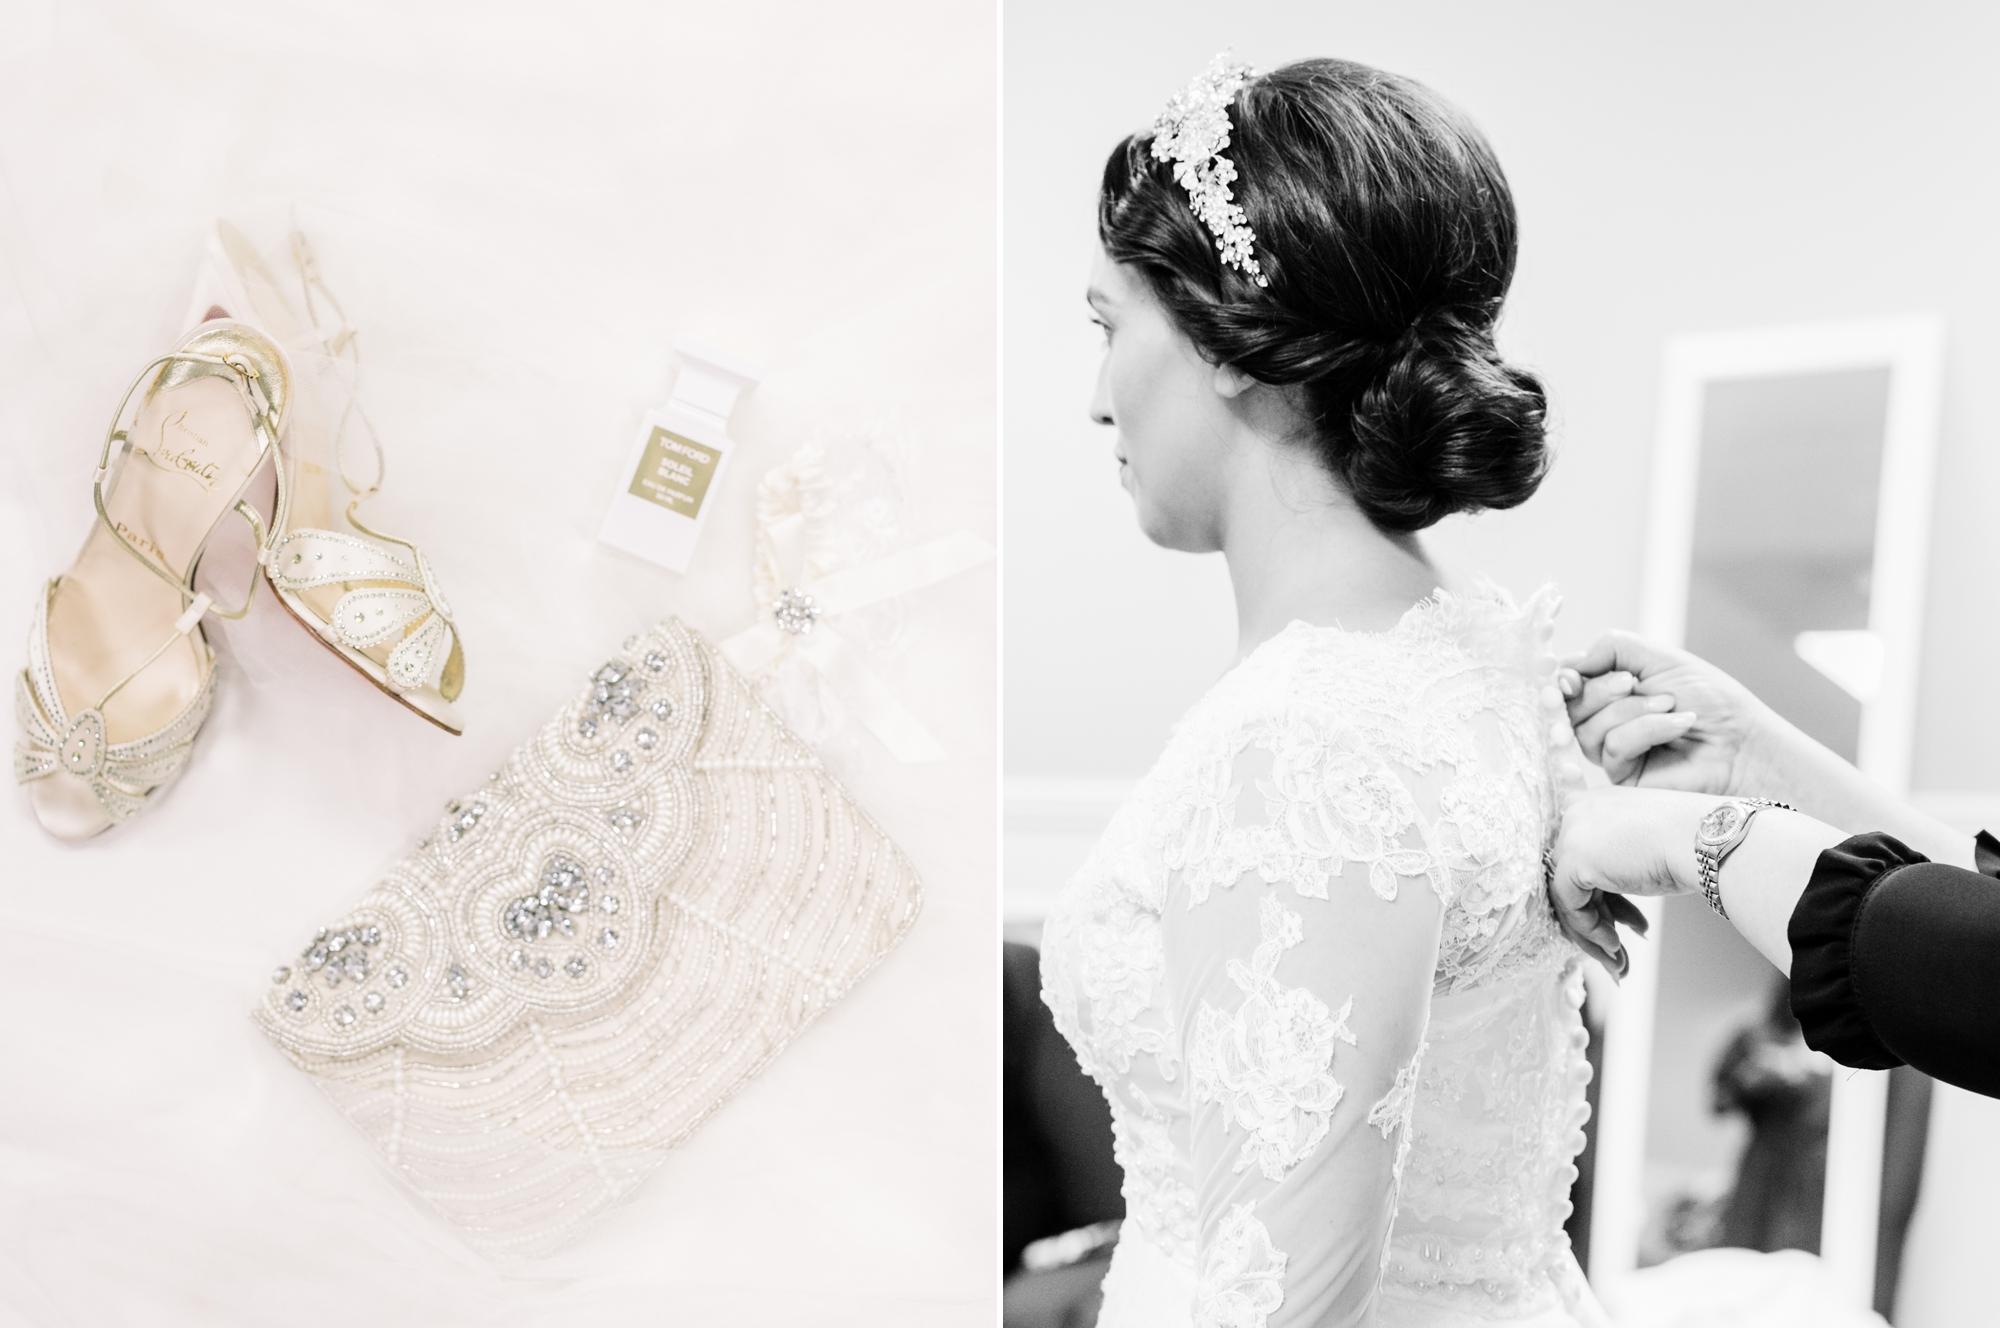 ROYAL-WEDDING-RICHARD-NIXON-LIBRARY 2.jpg